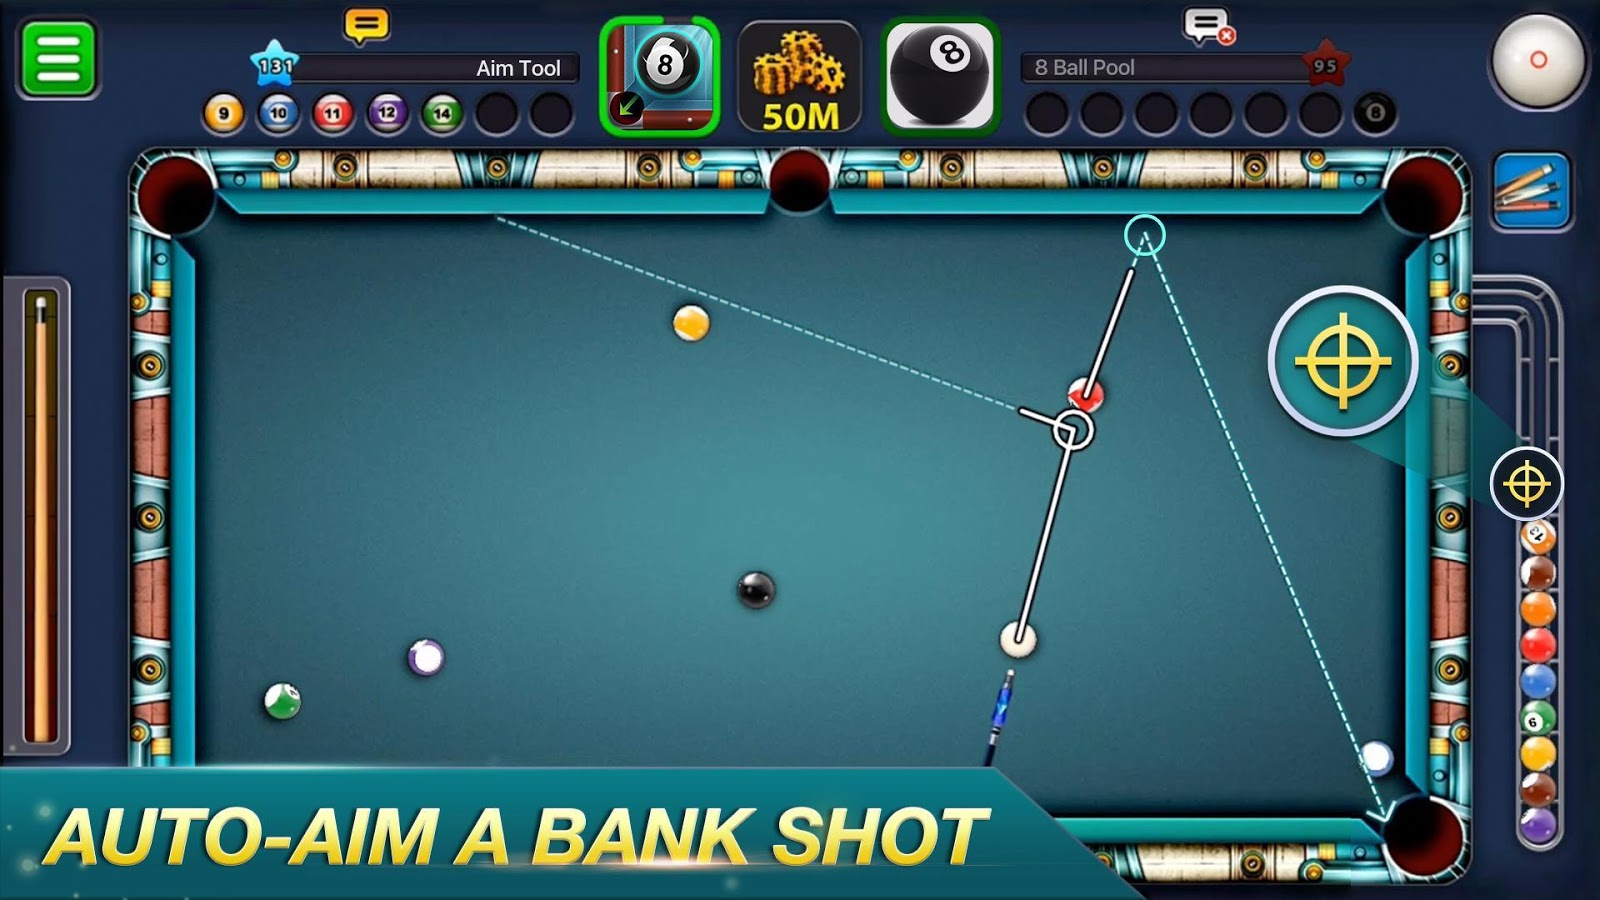 8 Ball Pool Hileli APK - Android Bilardo Oyunu v5.0.0